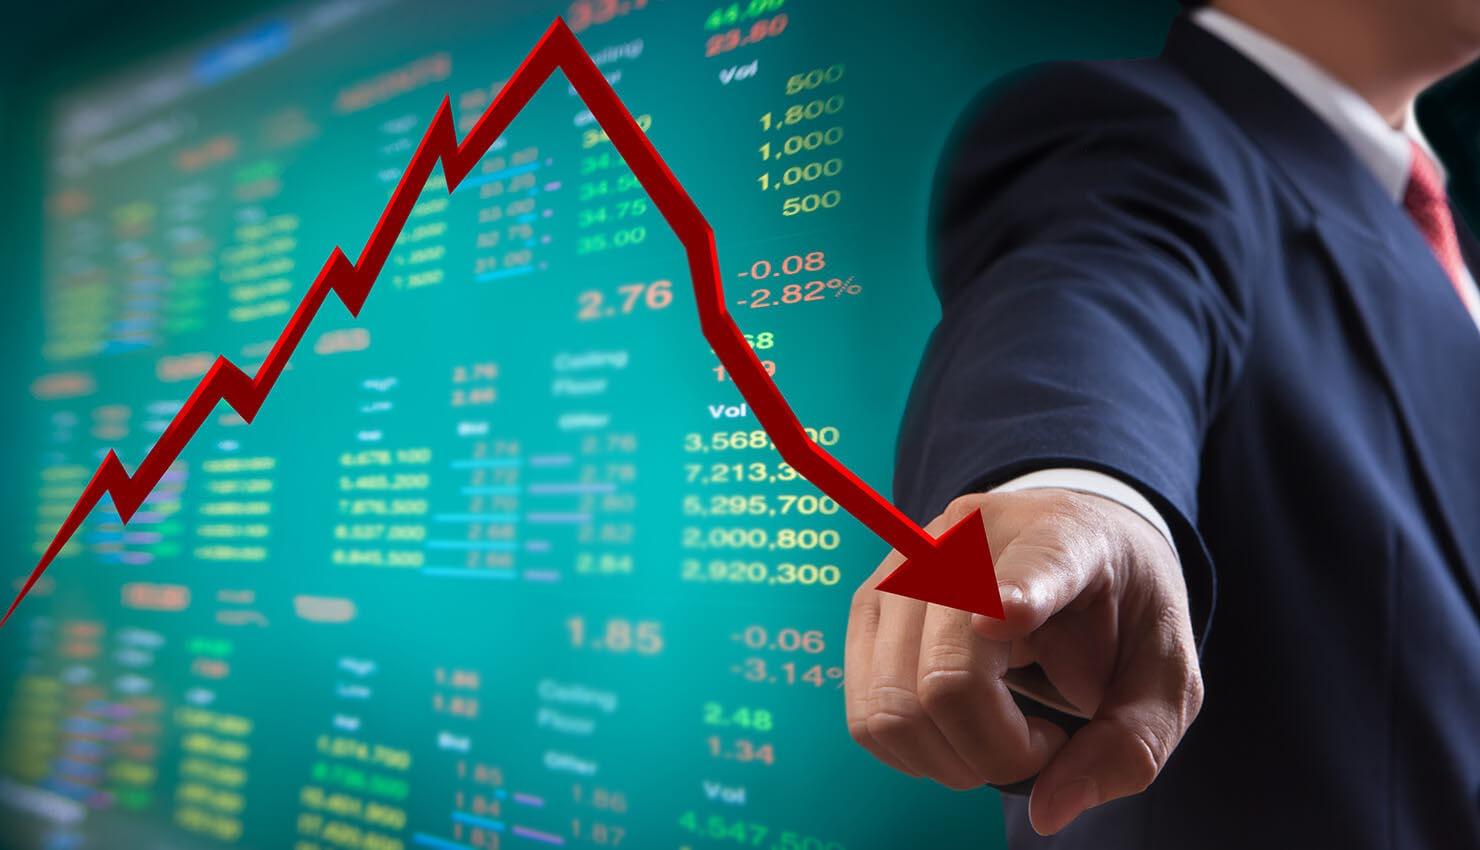 Cryptocurrency Market Has Taken a Downturn: Reason?